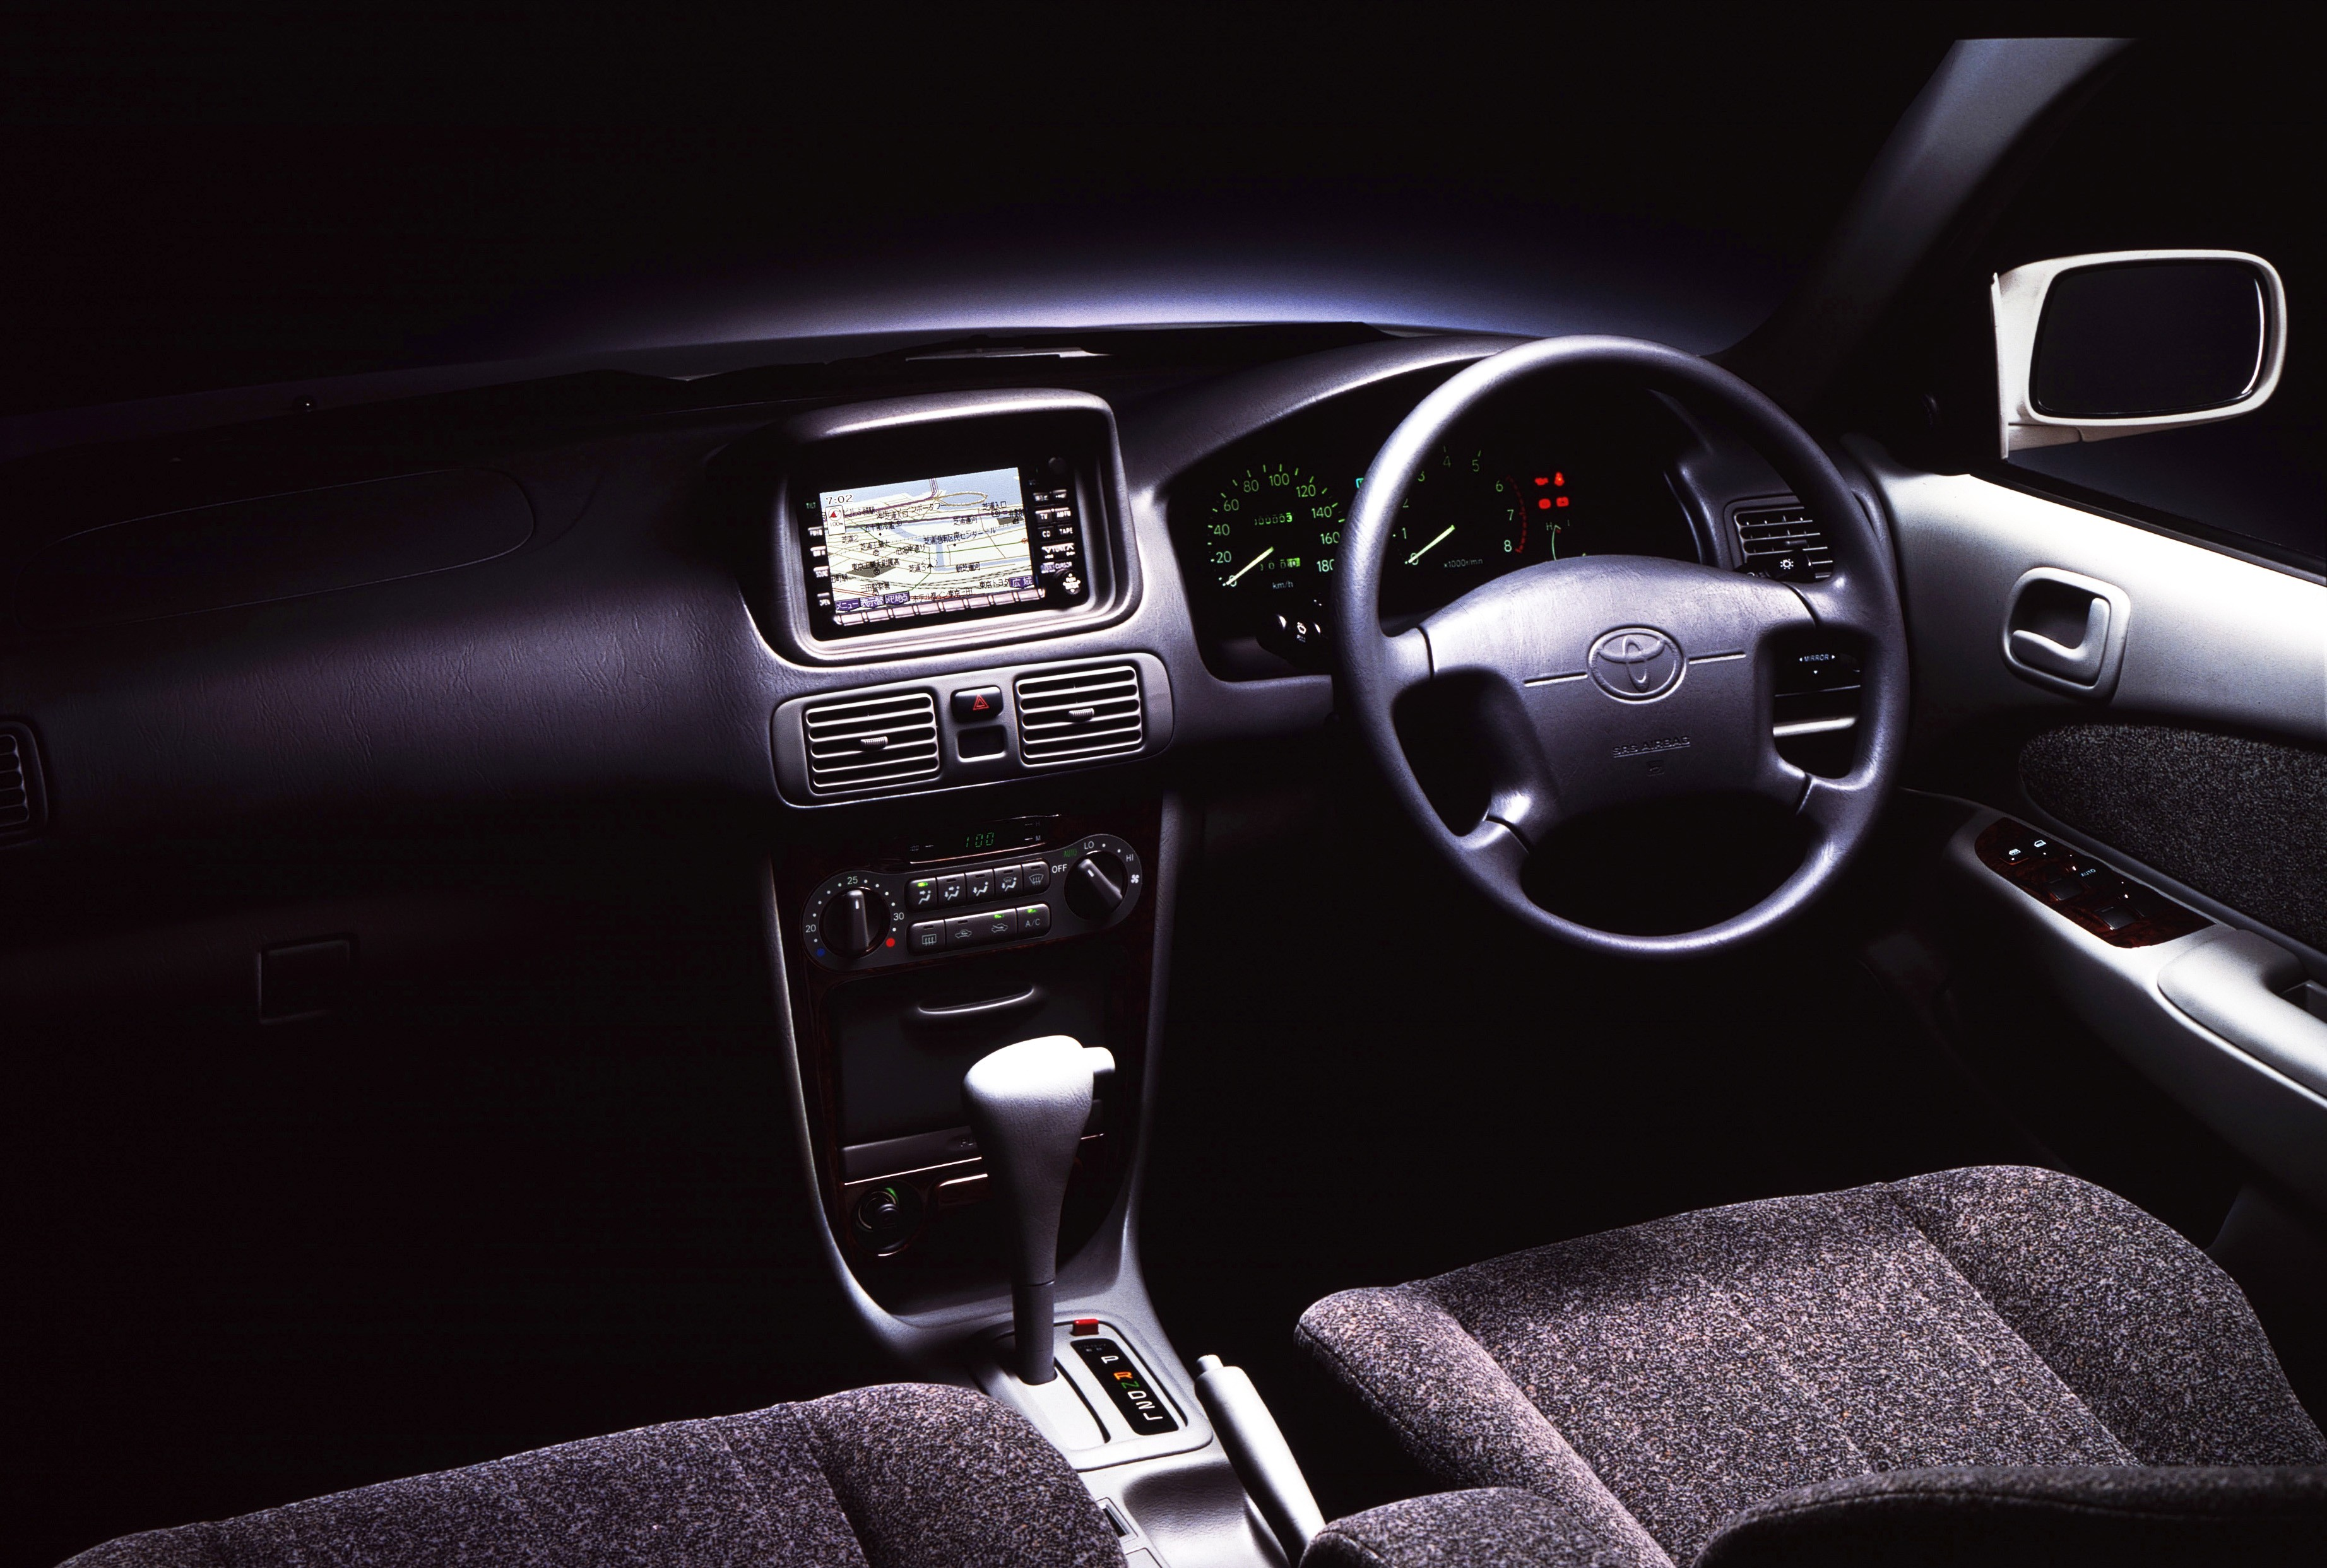 1999 Toyota Corolla Le Fuel Jeep anche Fuel Gauge Wiring Diagram